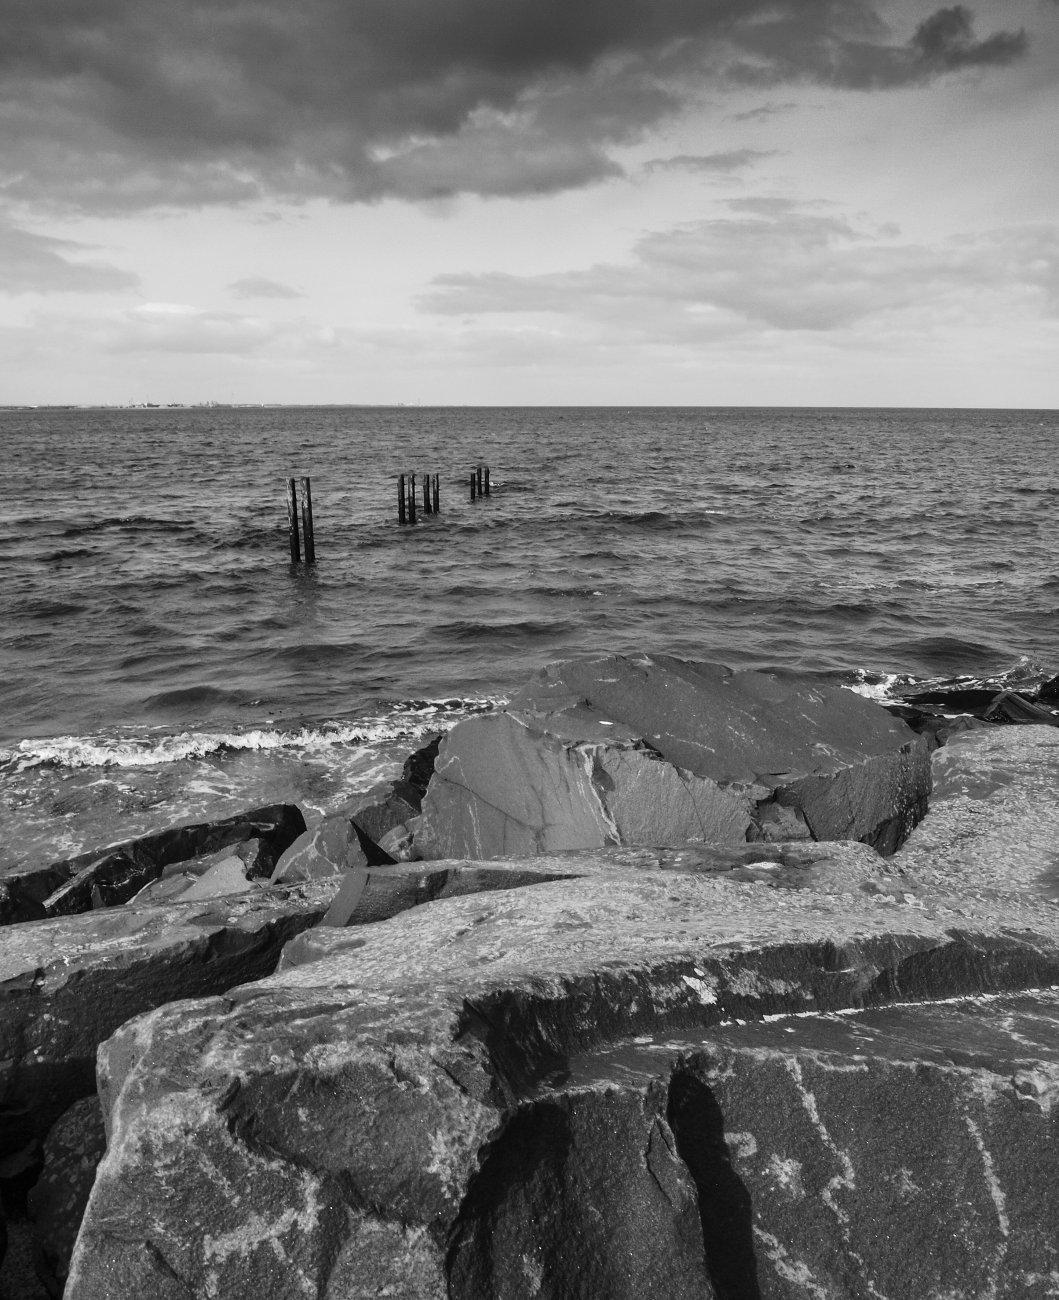 rocky outlook